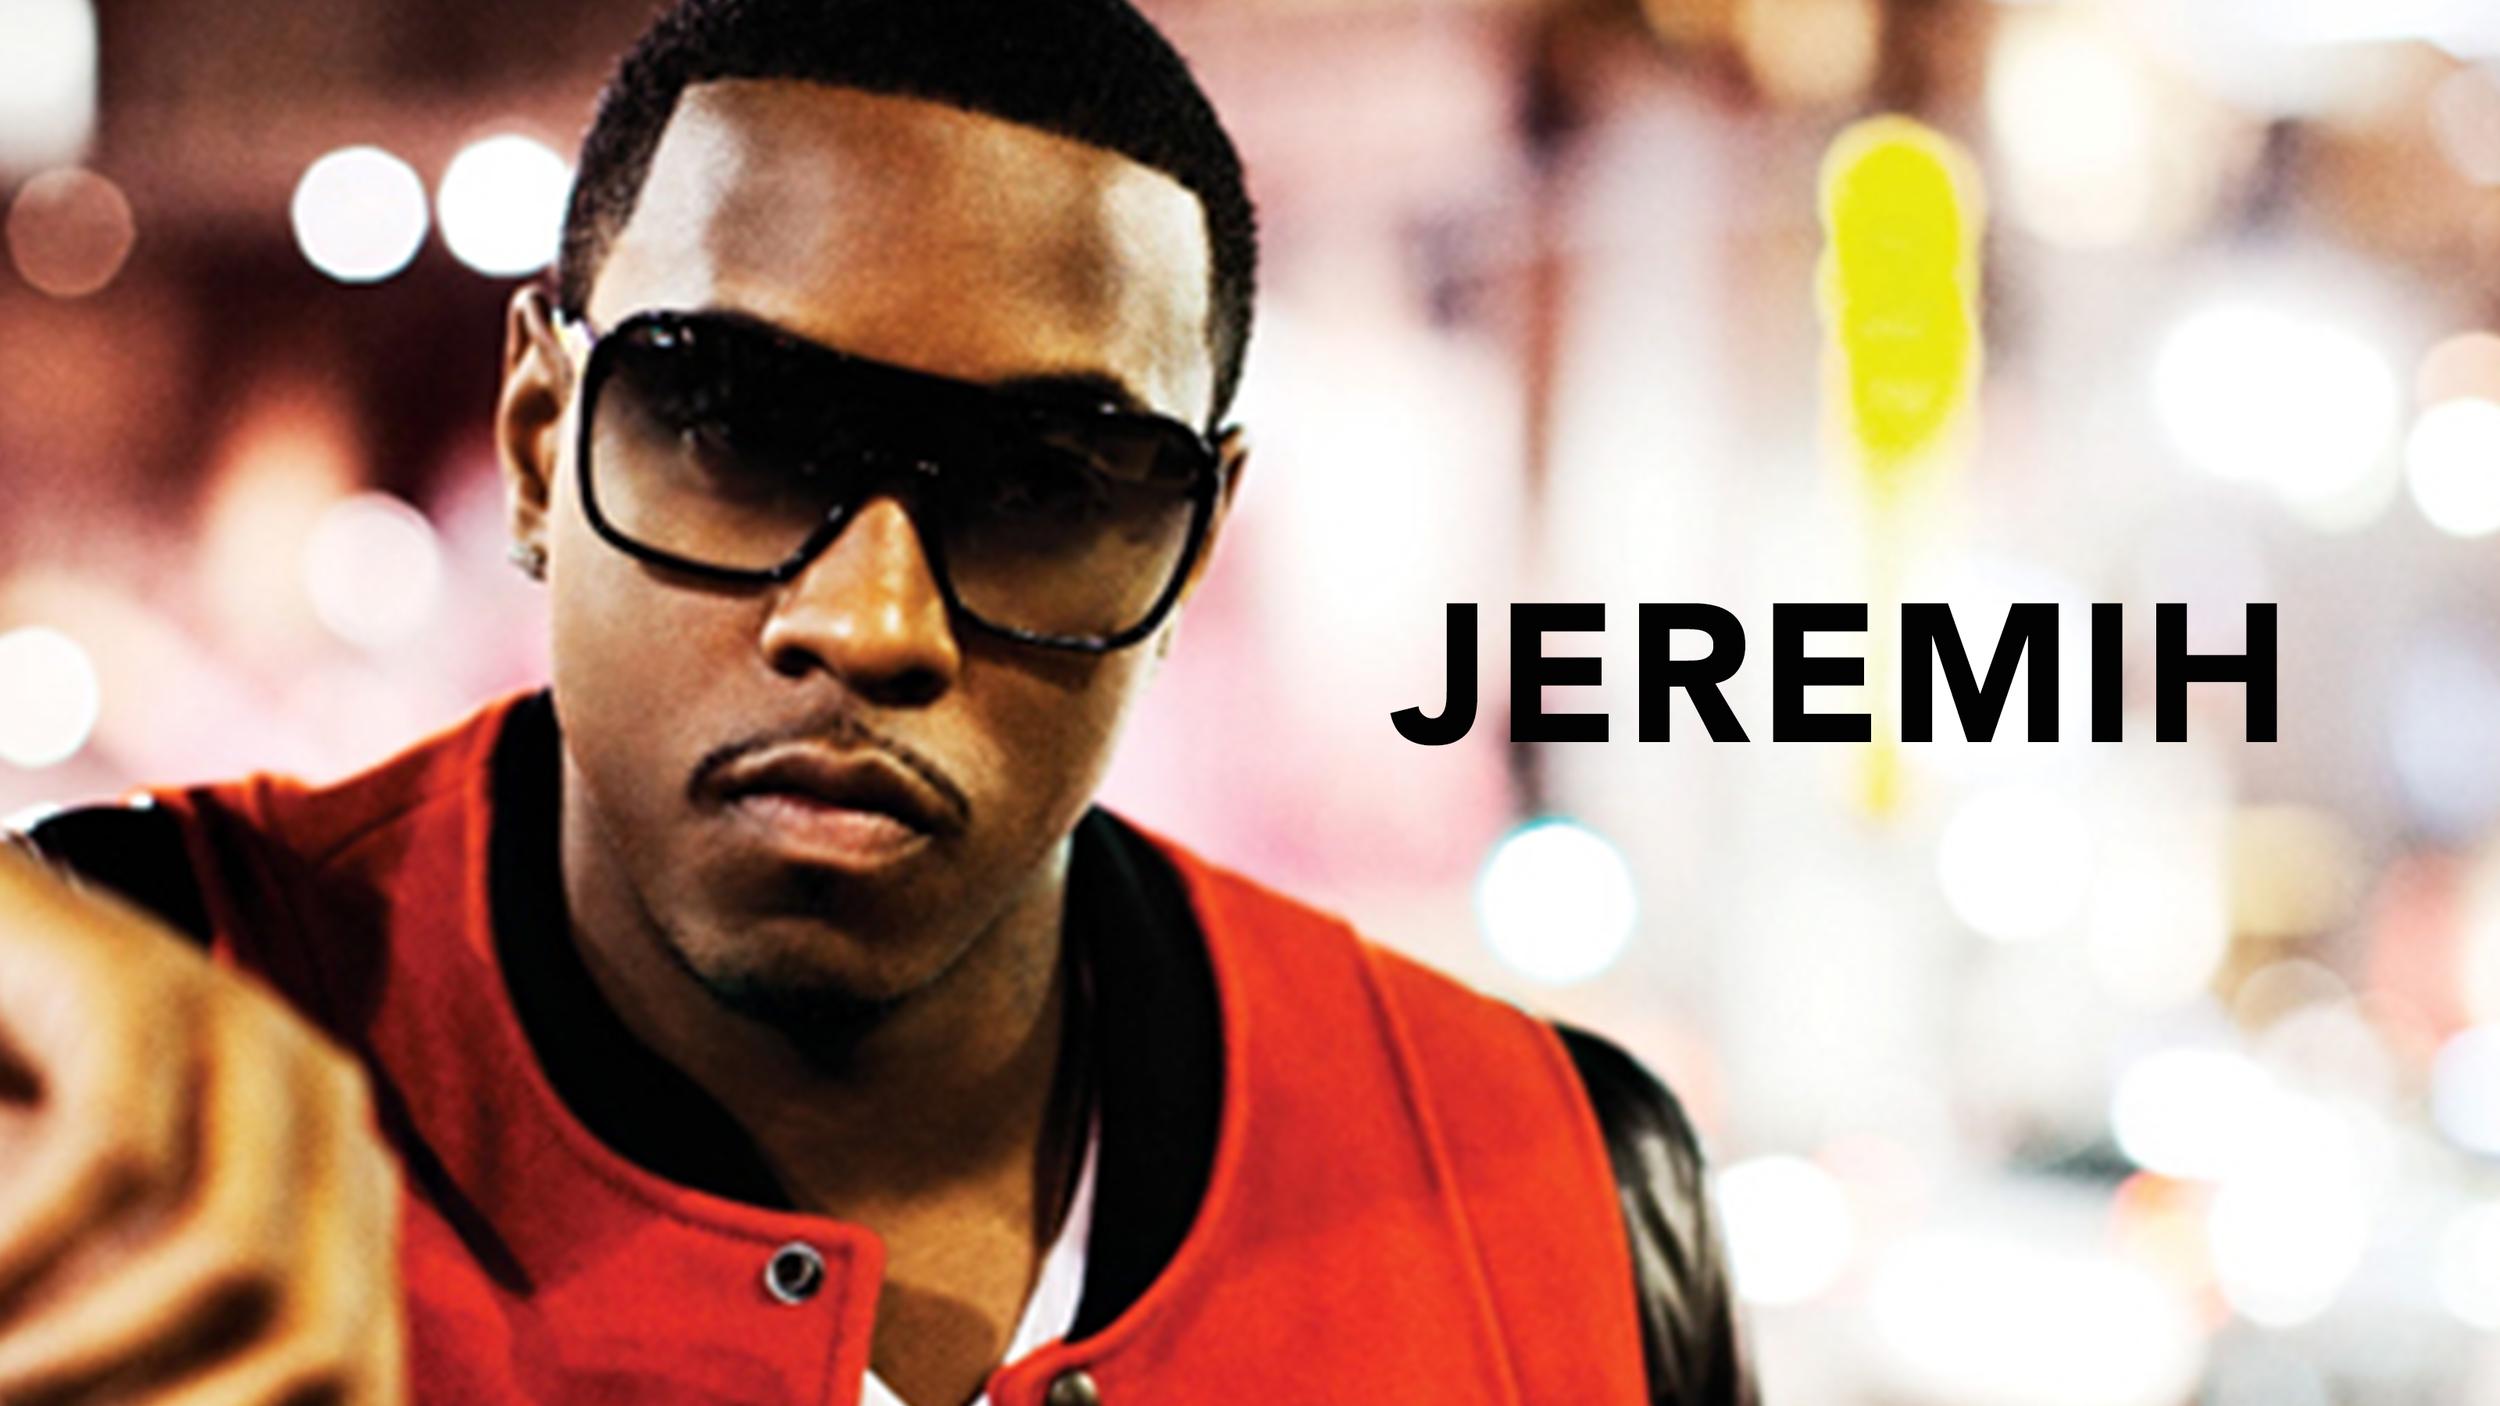 Jeremih.png